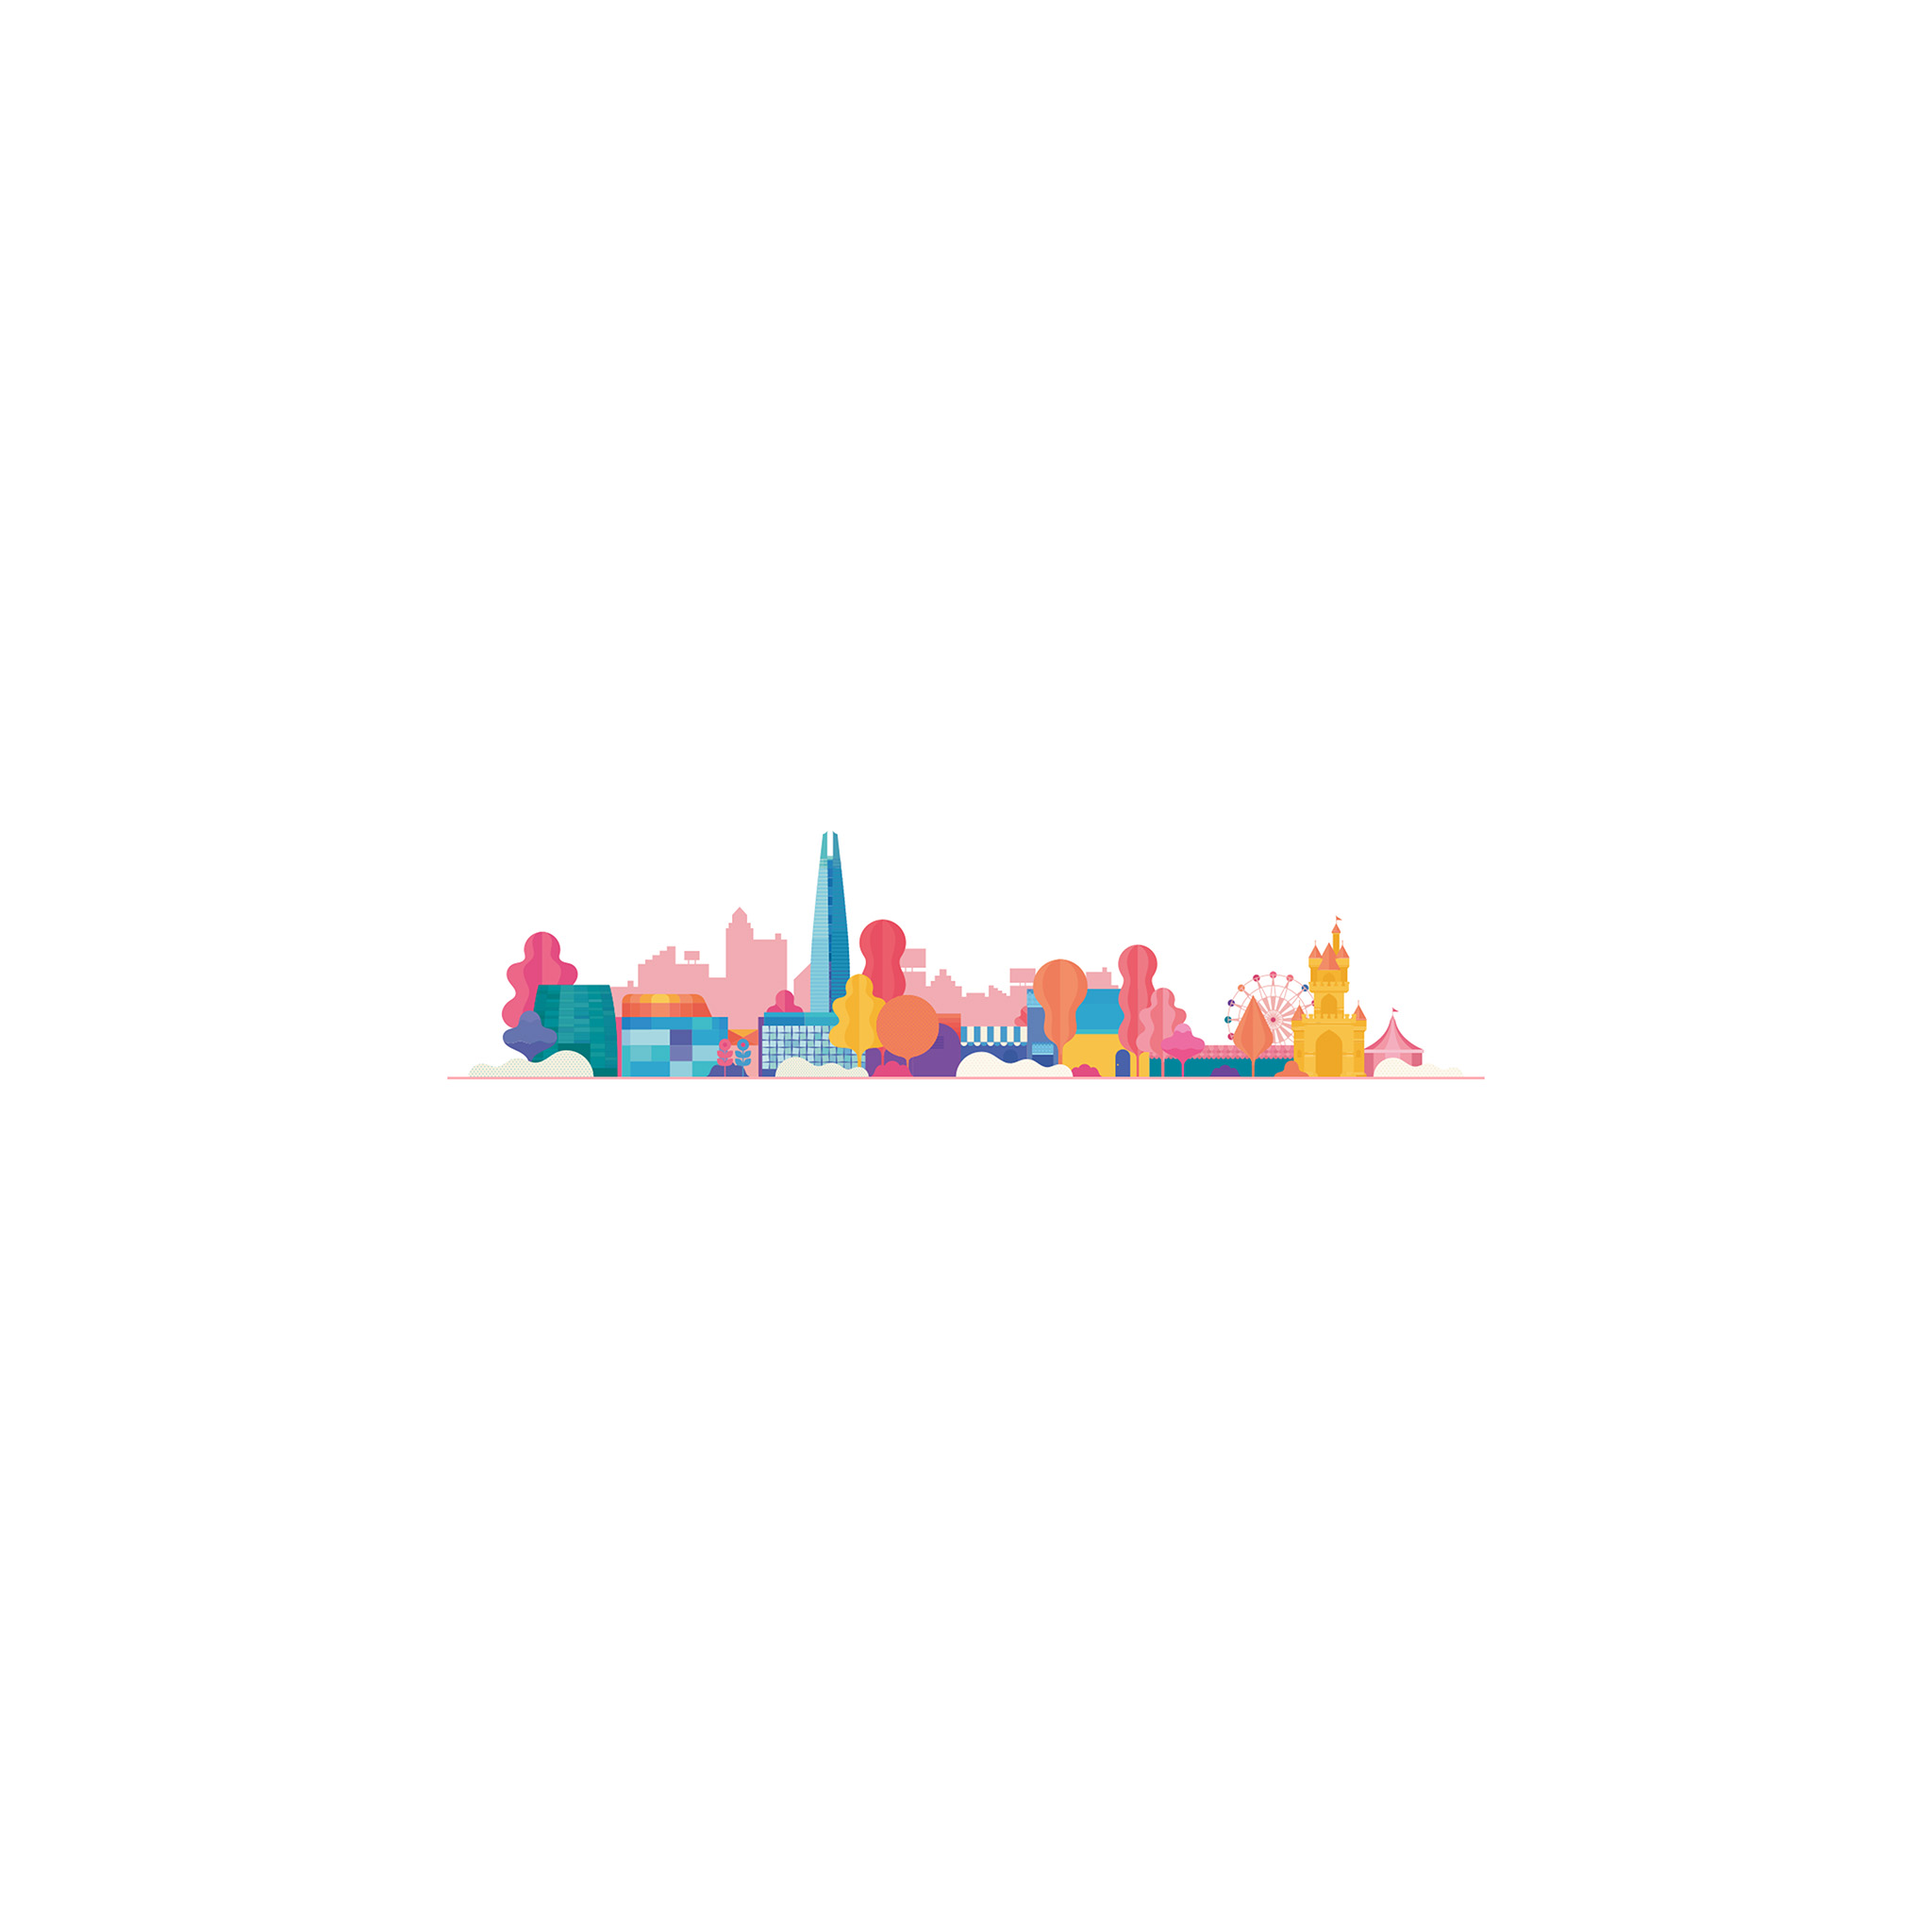 Pc Cartoon Fall Wallpapers Ba13 City Cute White Illustration Art Minimal Wallpaper